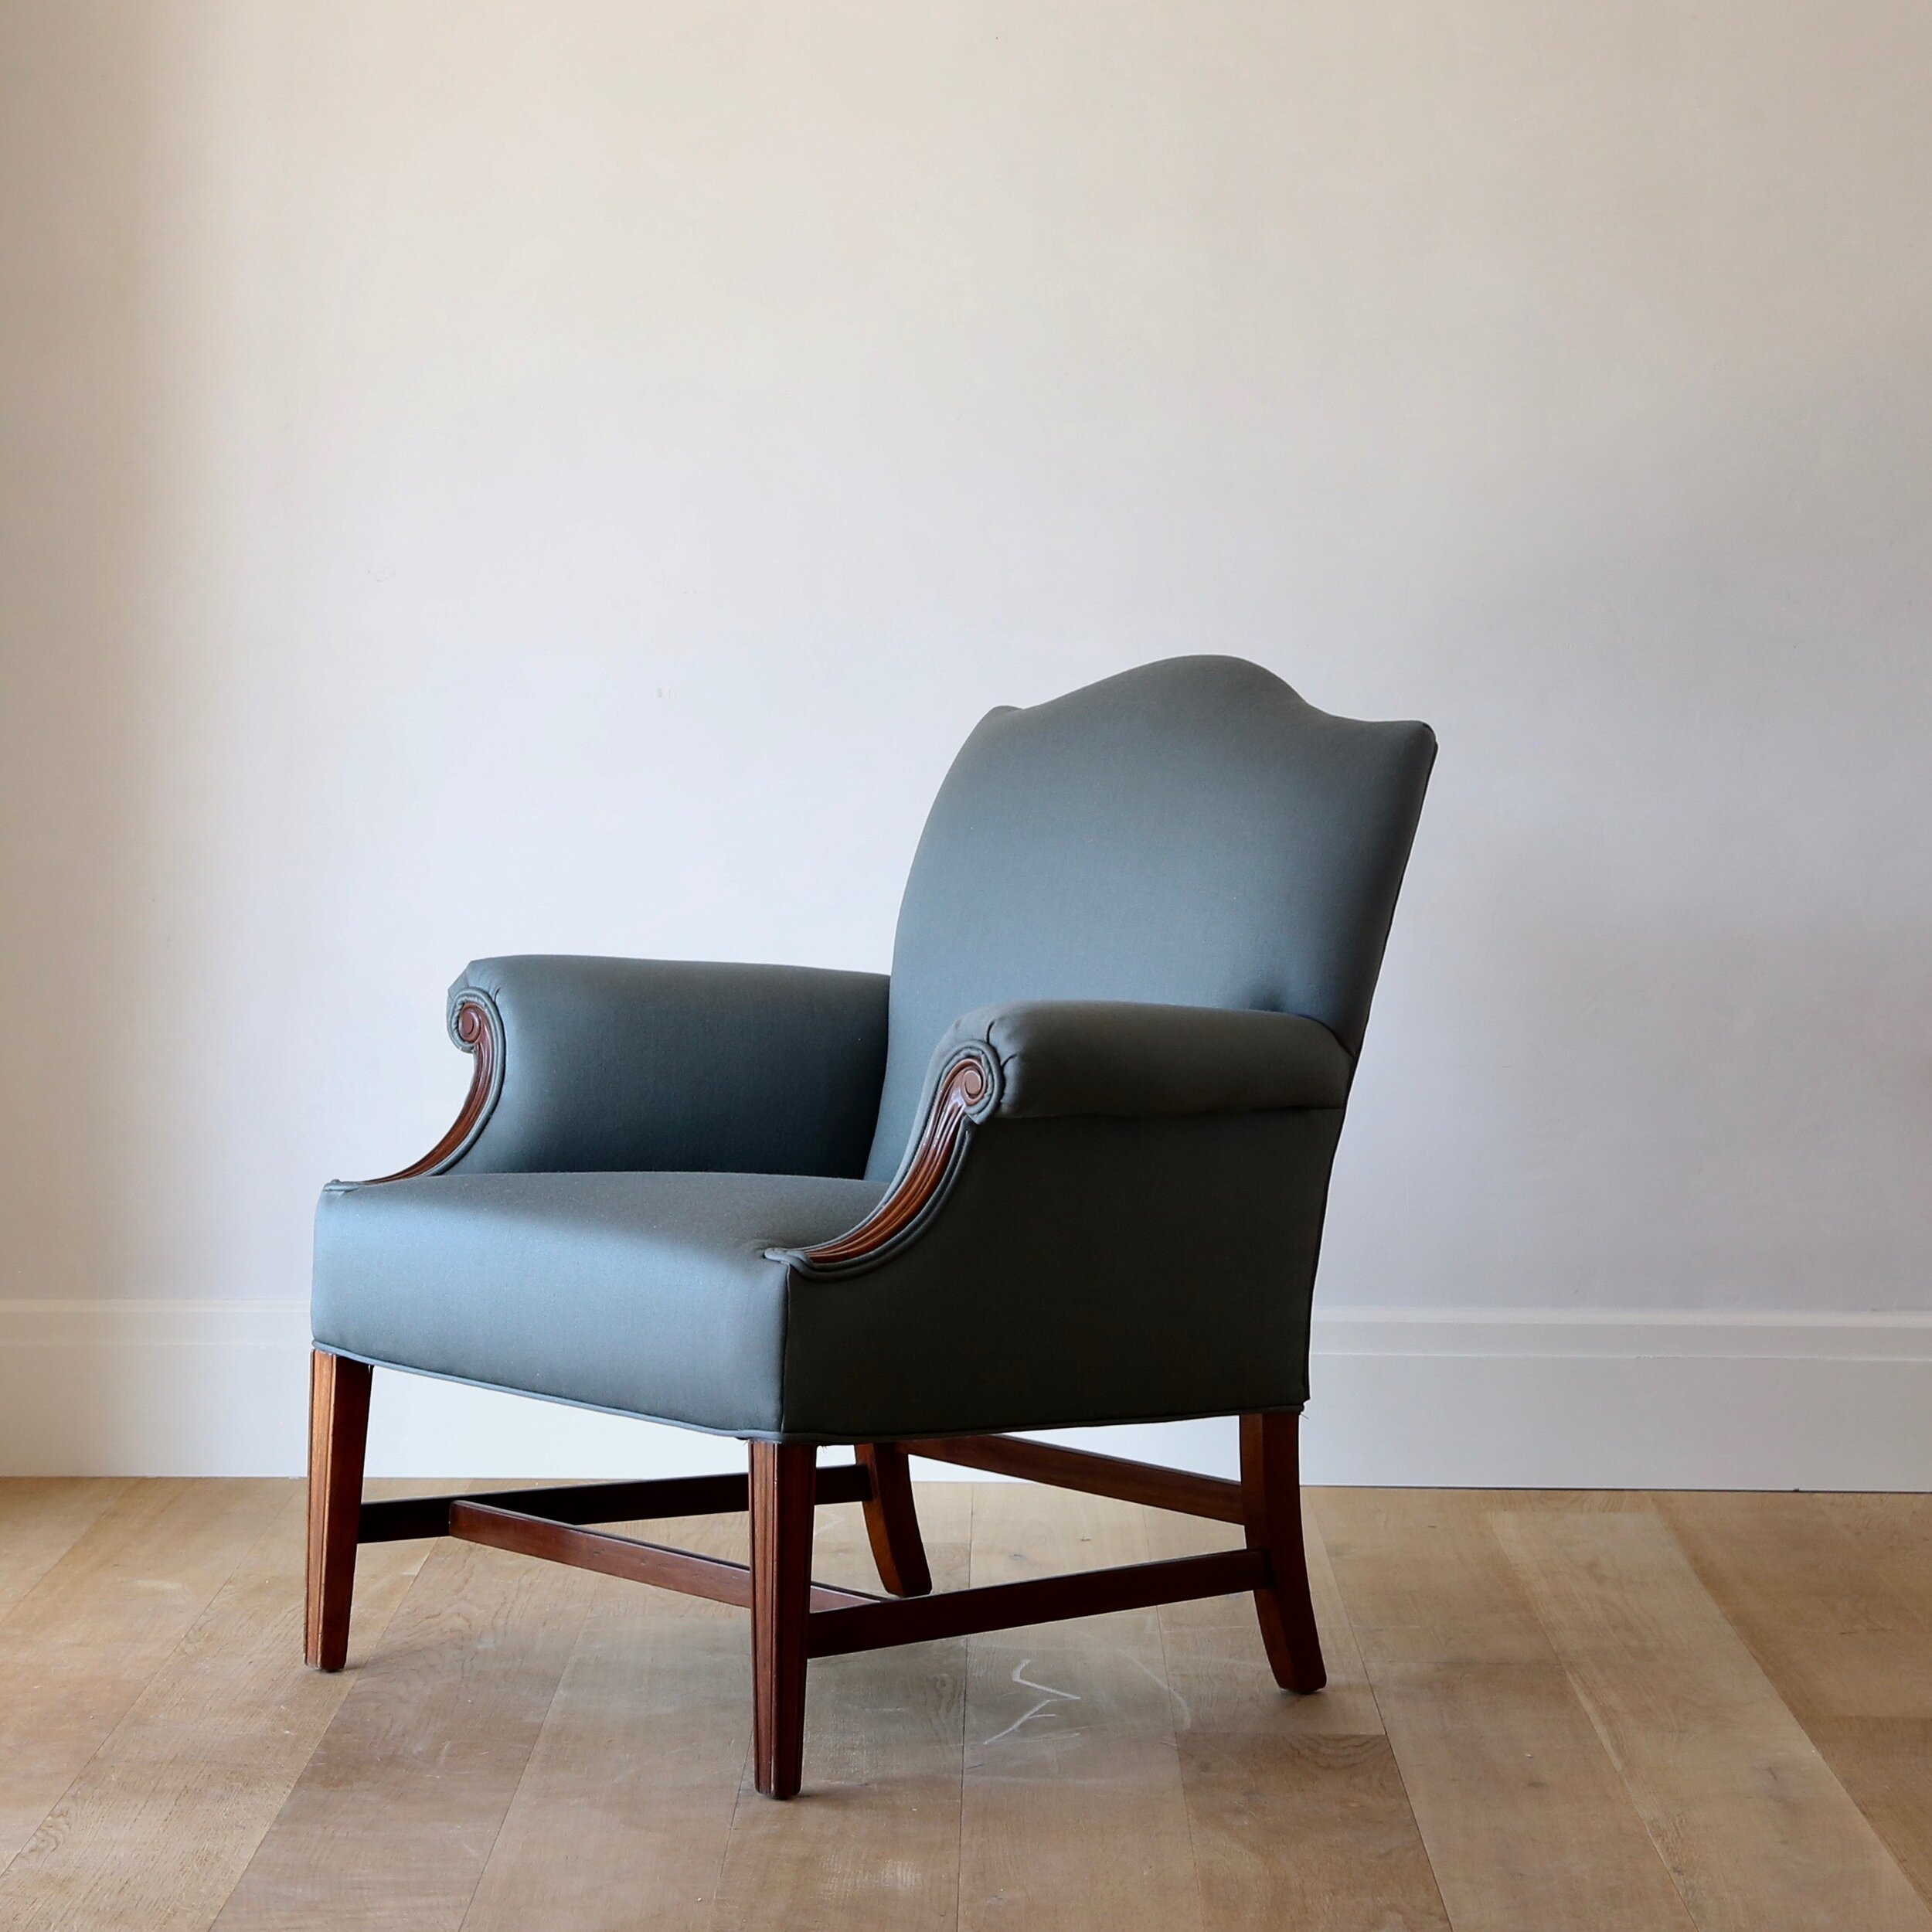 Amy Meier_English chair.jpg